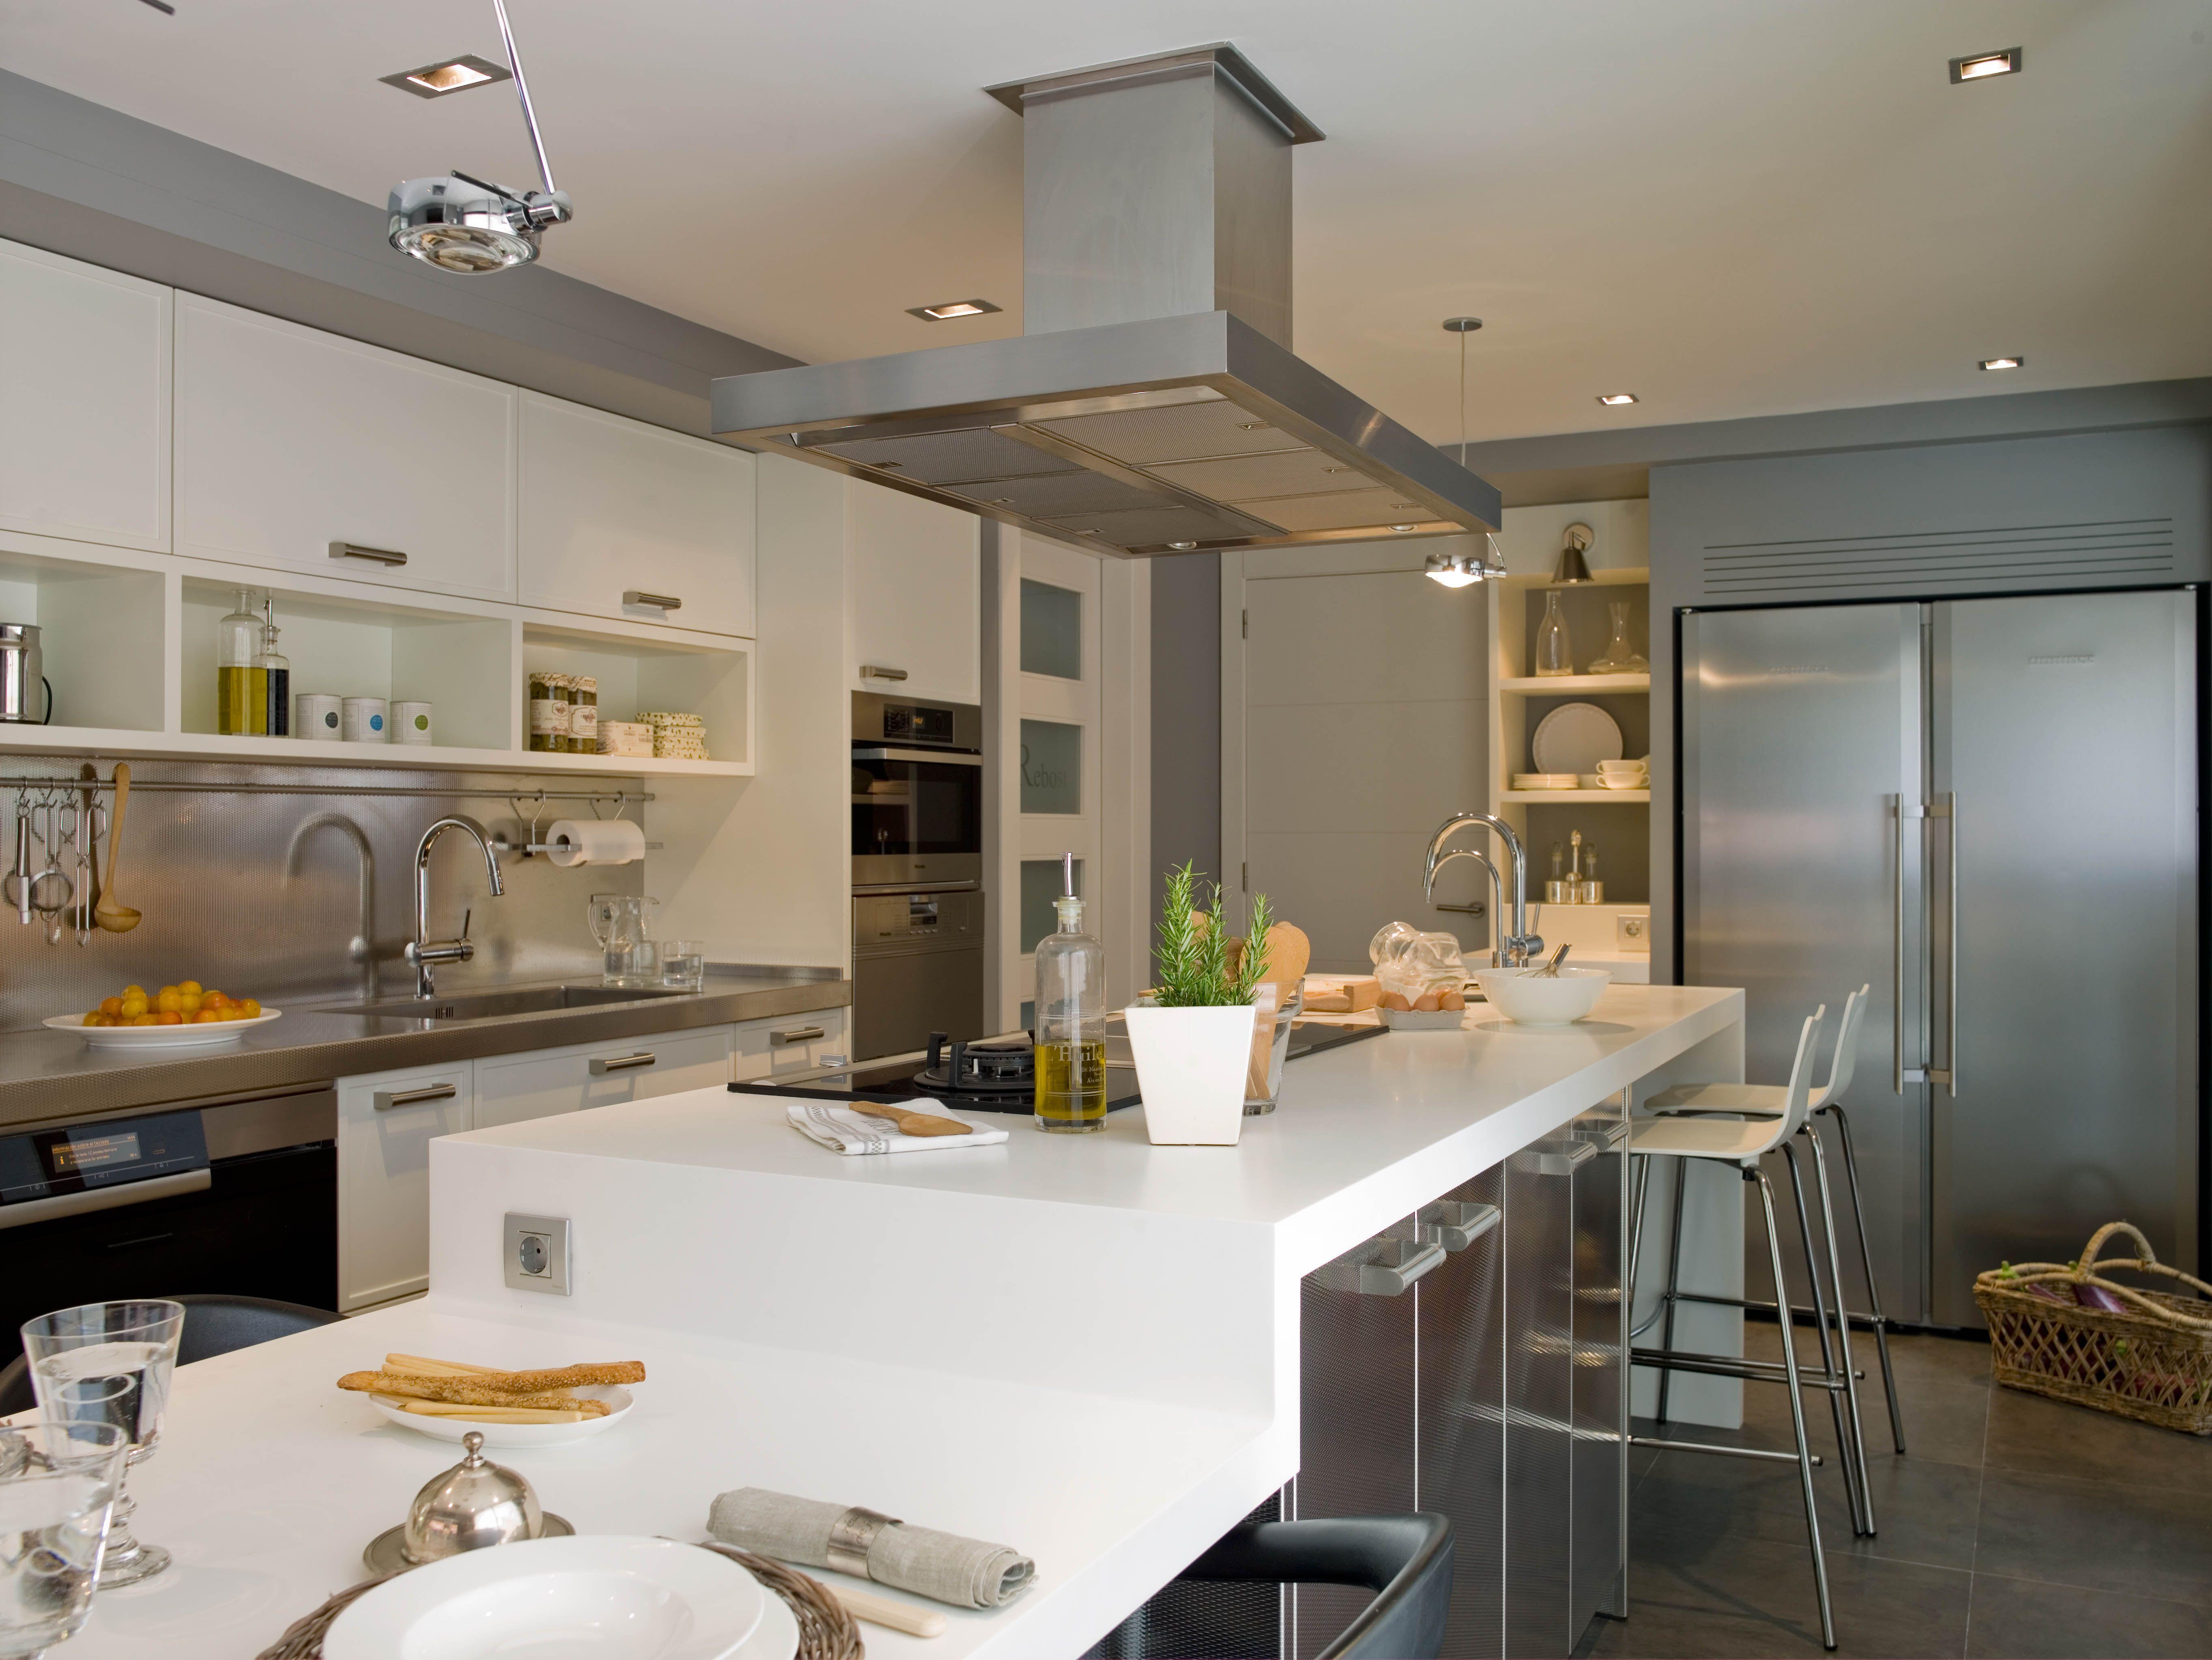 Cocina de diseño moderno equipada con electrodomésticos Liebherr ...